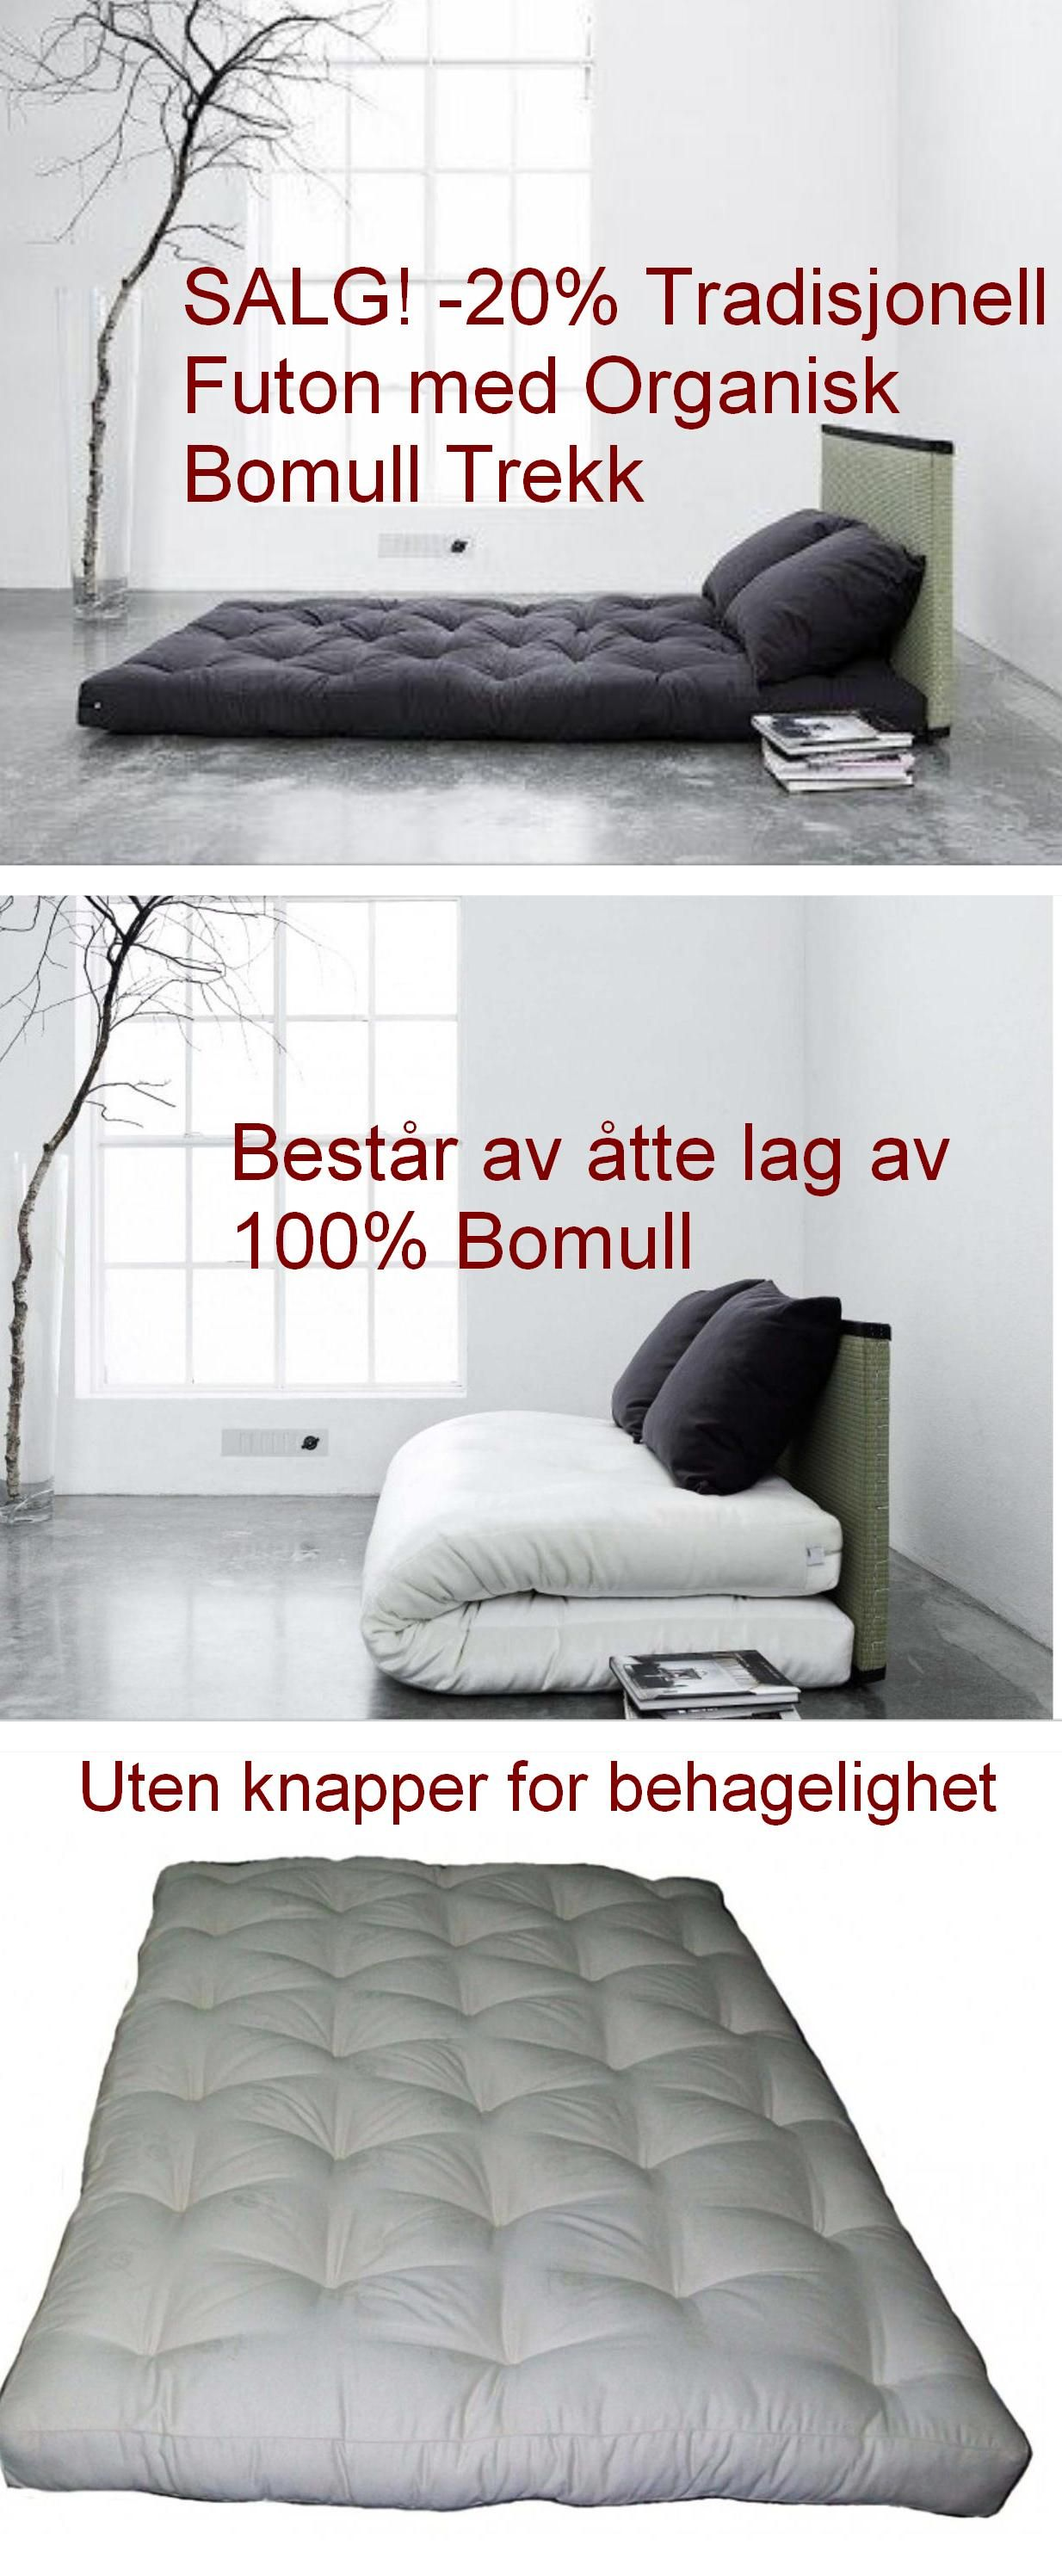 Allerede På Lager Stylehouse No Bed Beds Eco Friendly Mattress